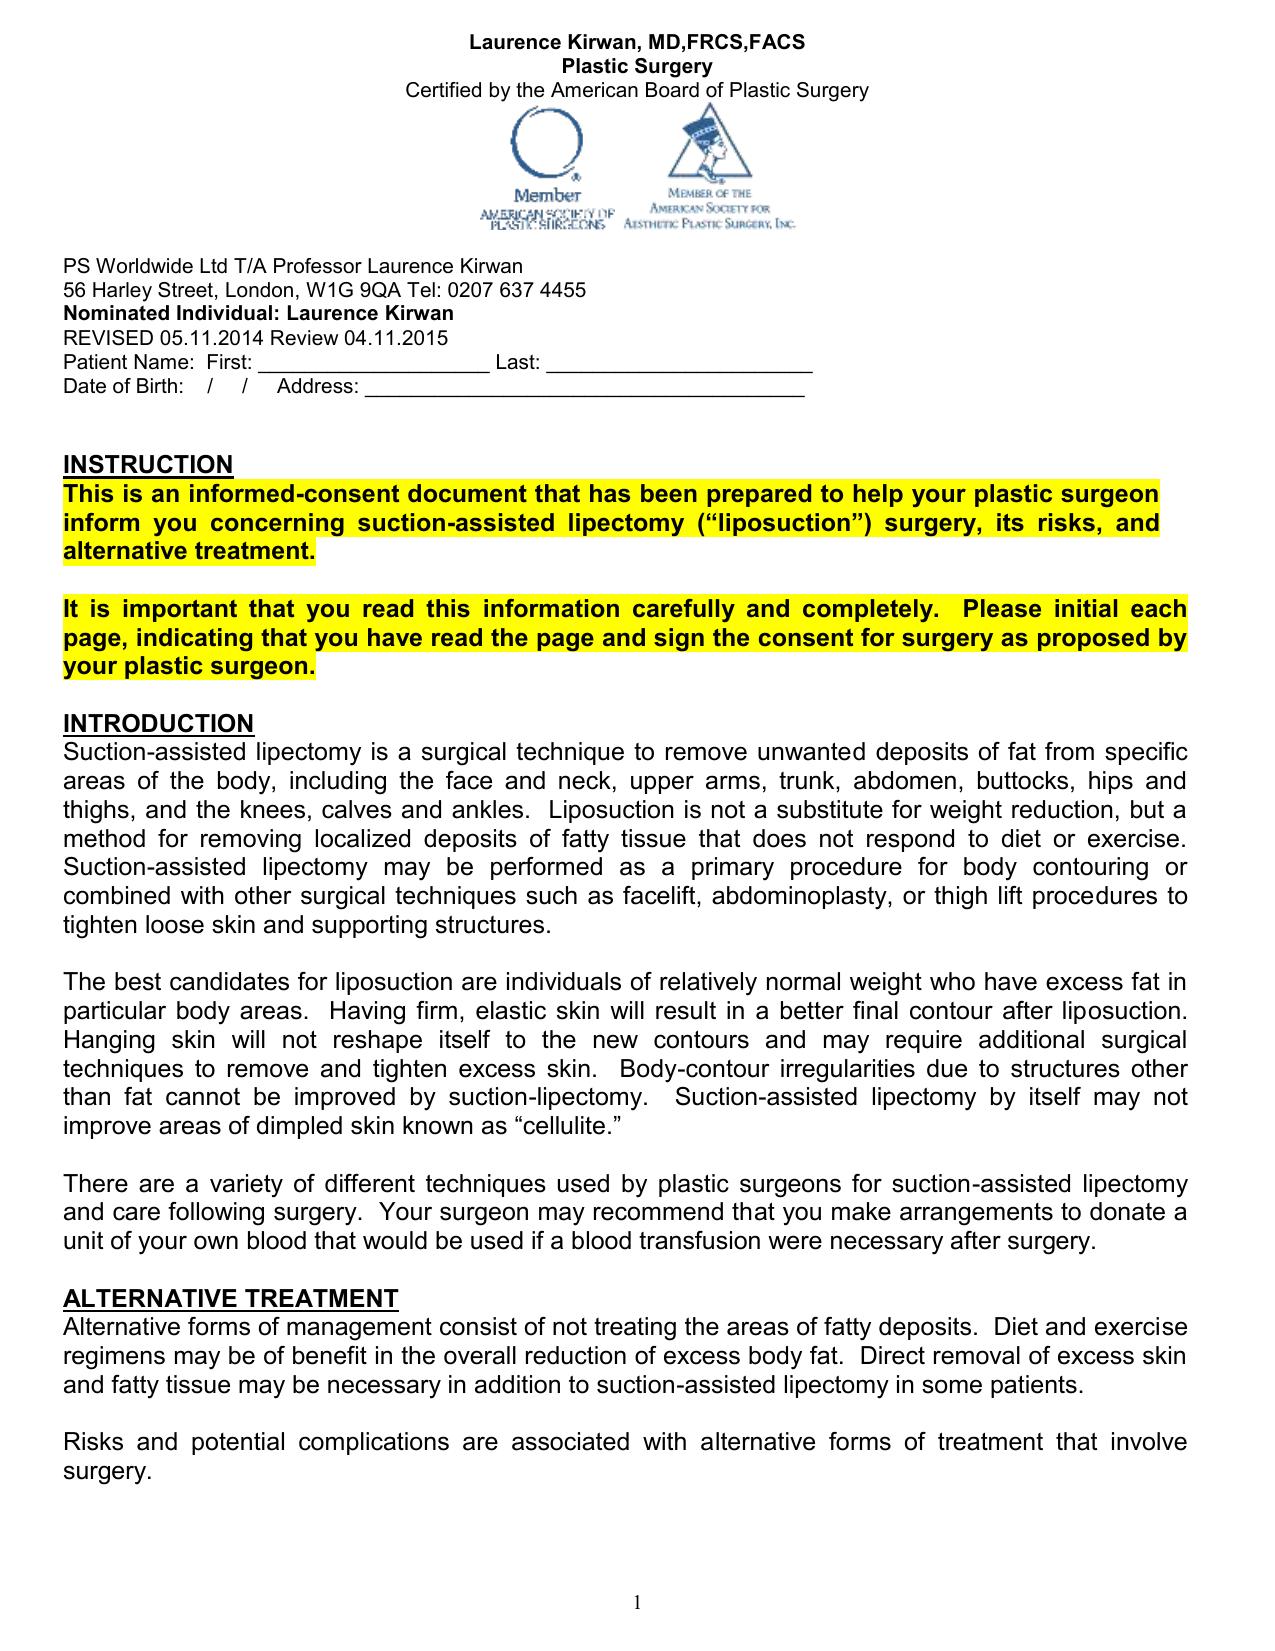 UK Liposuction Informed Consent Form